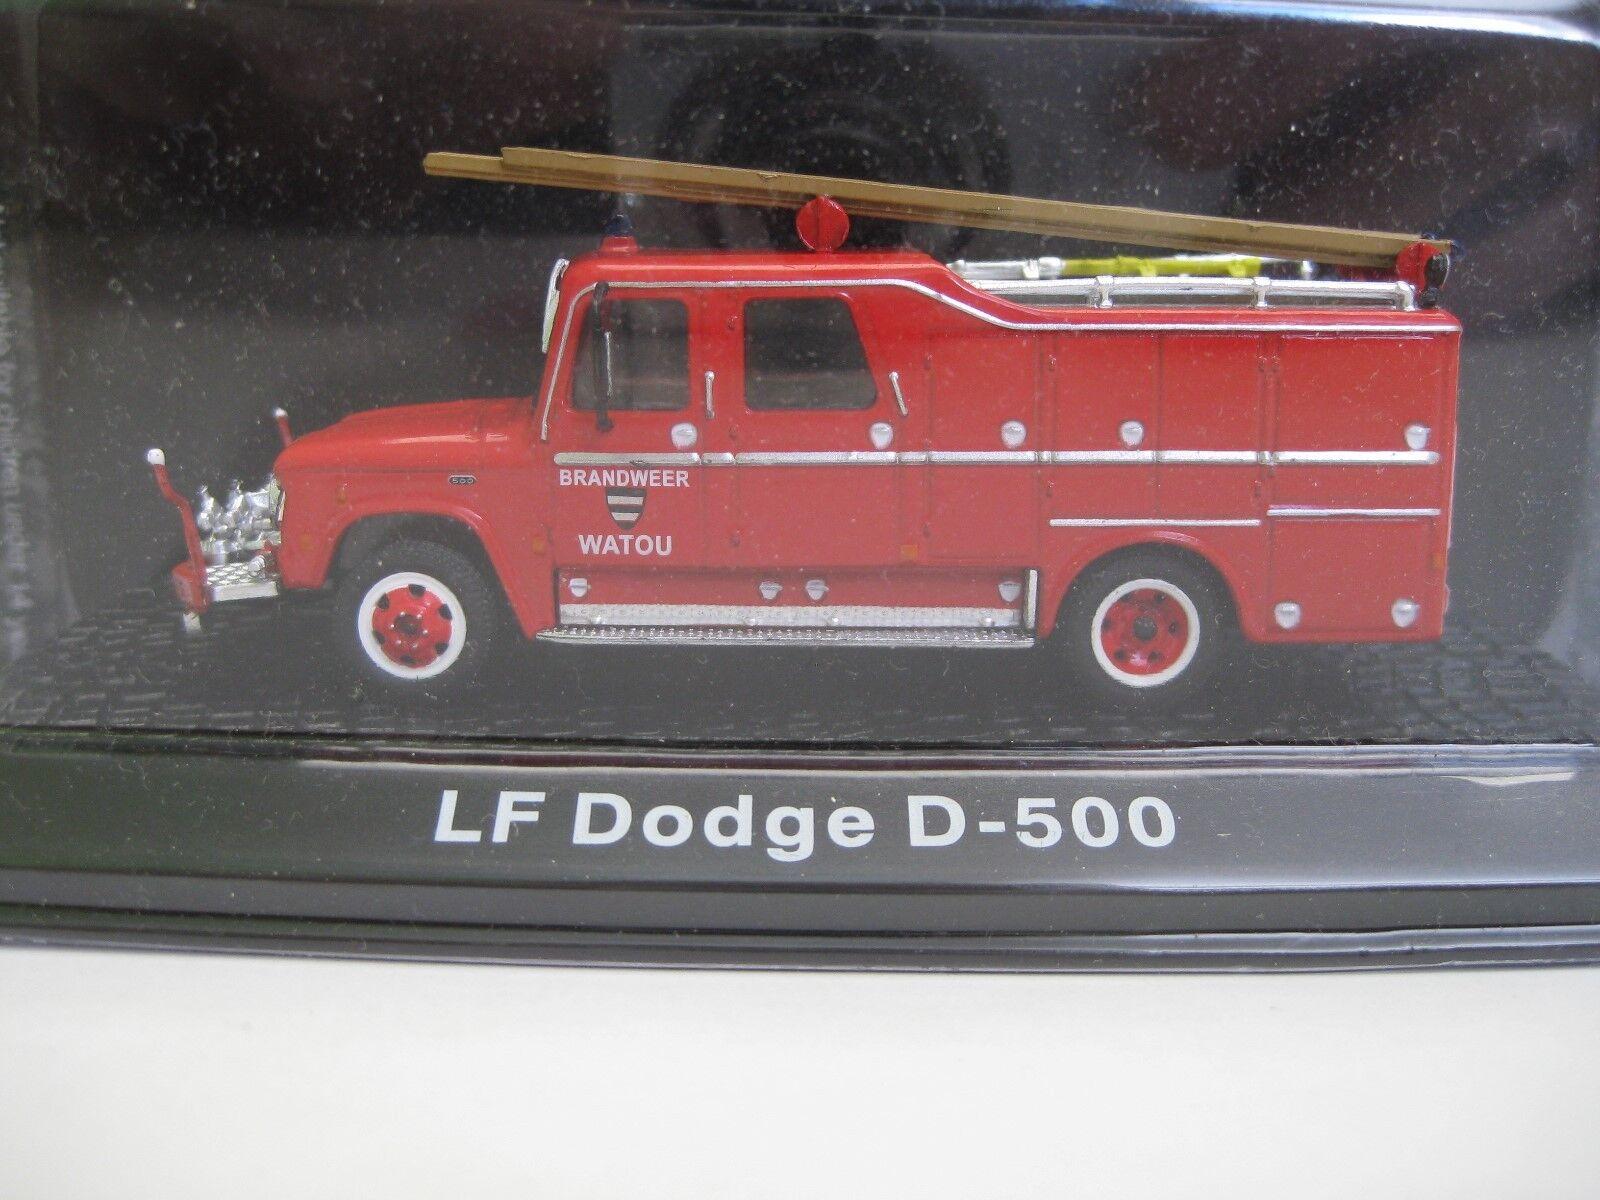 De Agostini 1 1 1 72 Konvolut 3 europäische Feuerwehrfahrzeuge, Metall  | Starker Wert  309e65